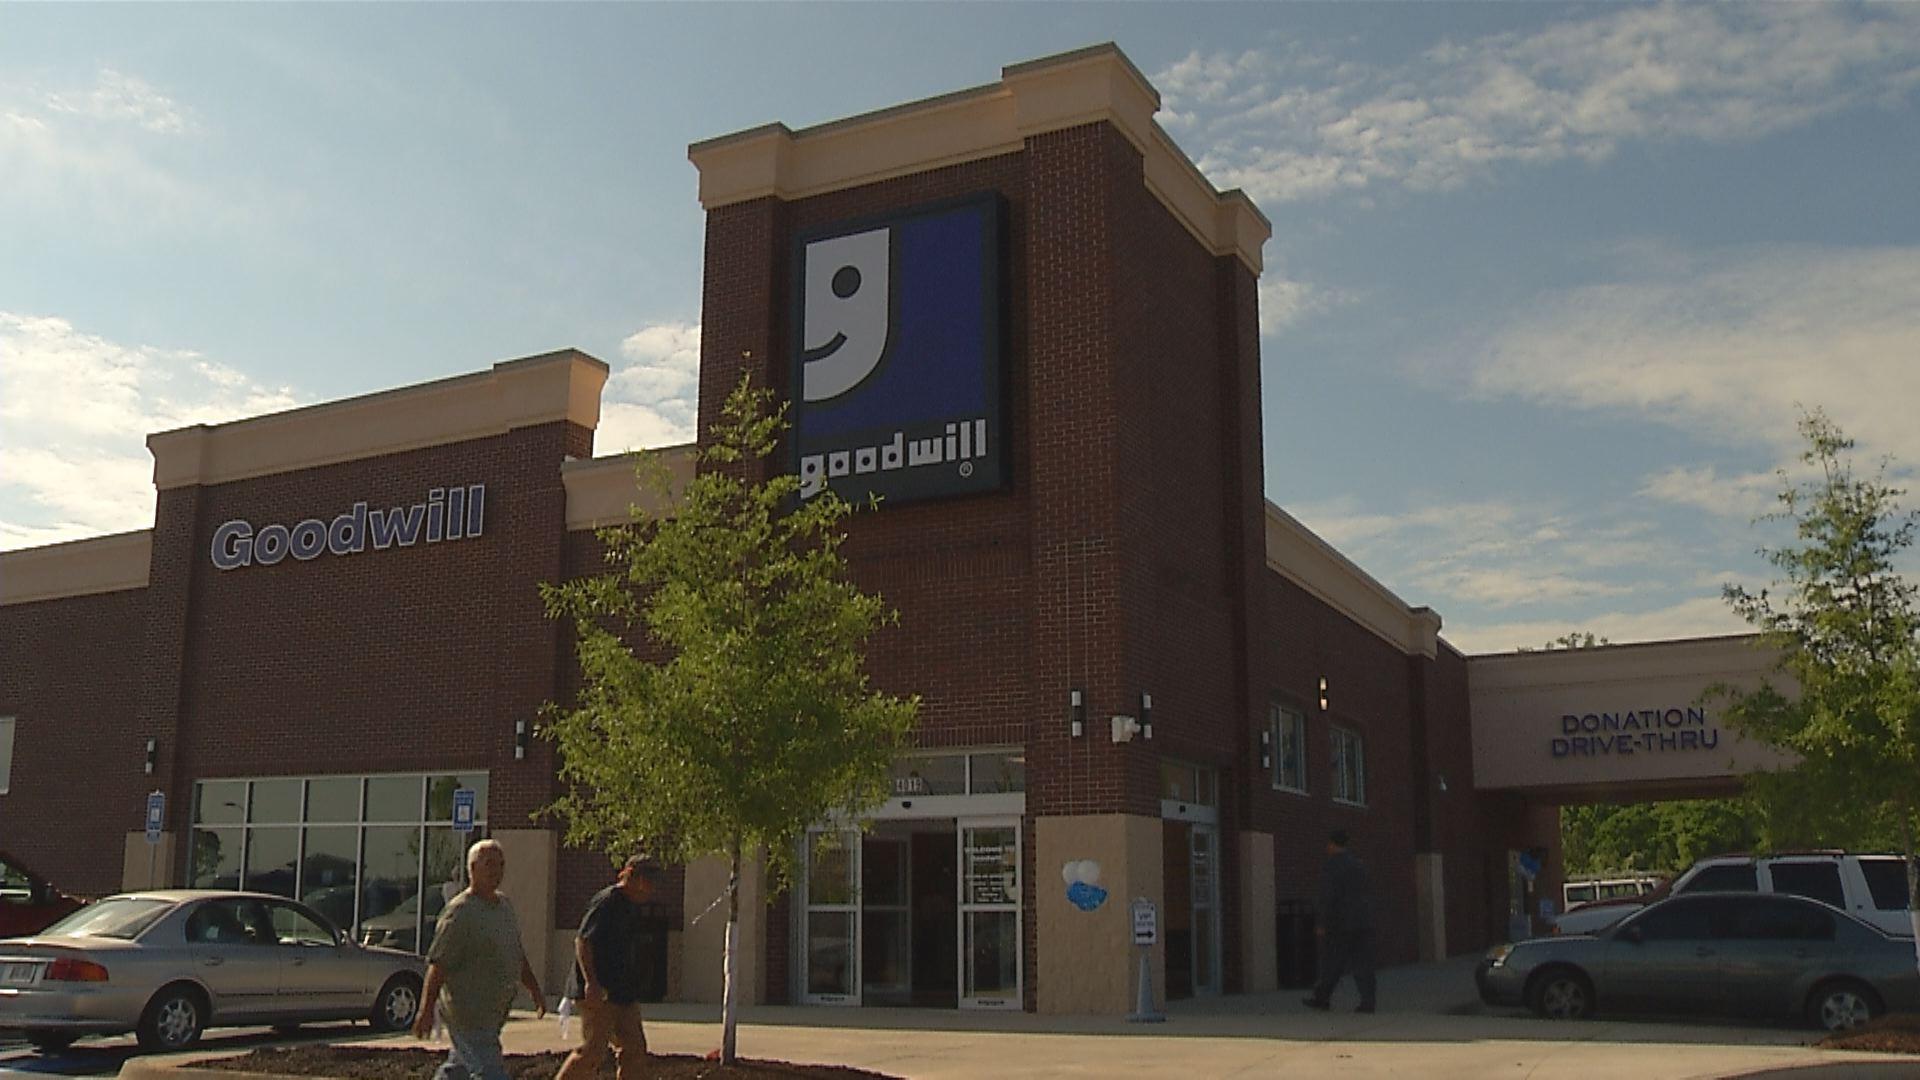 New Grovetown Goodwill Opens Up_146312